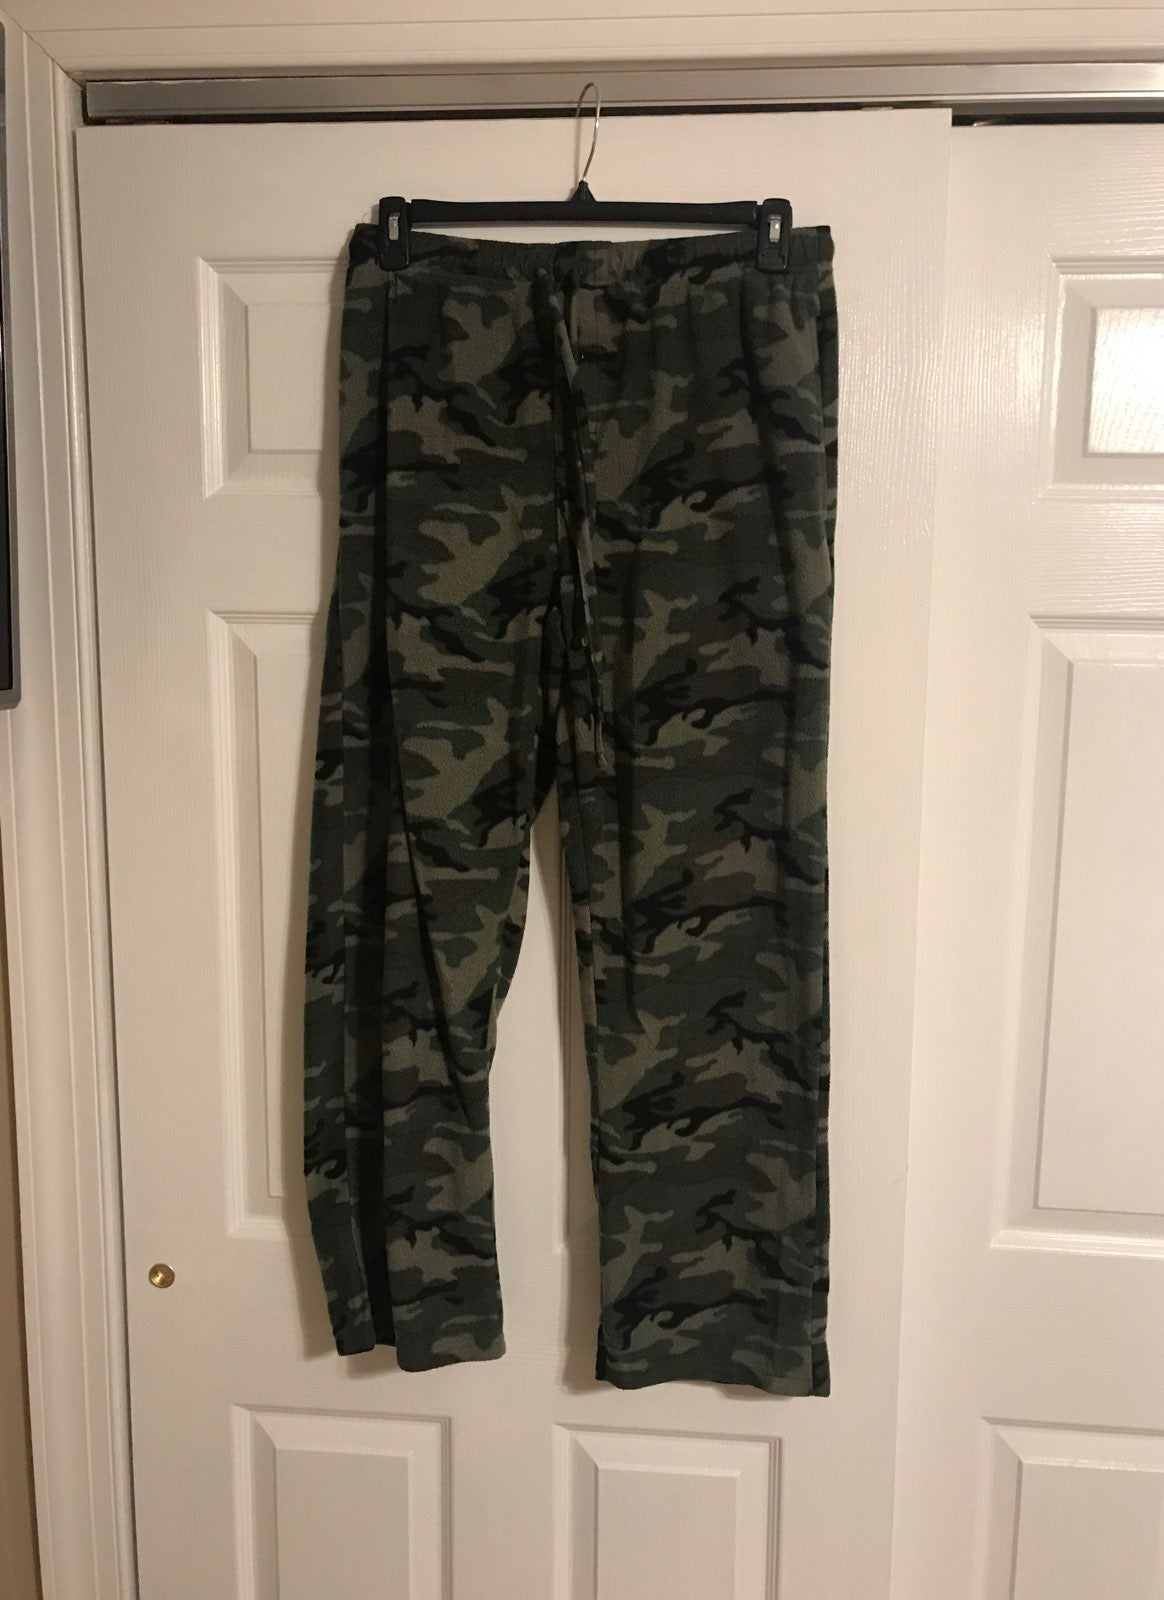 Men's fleece camo Pajama pants